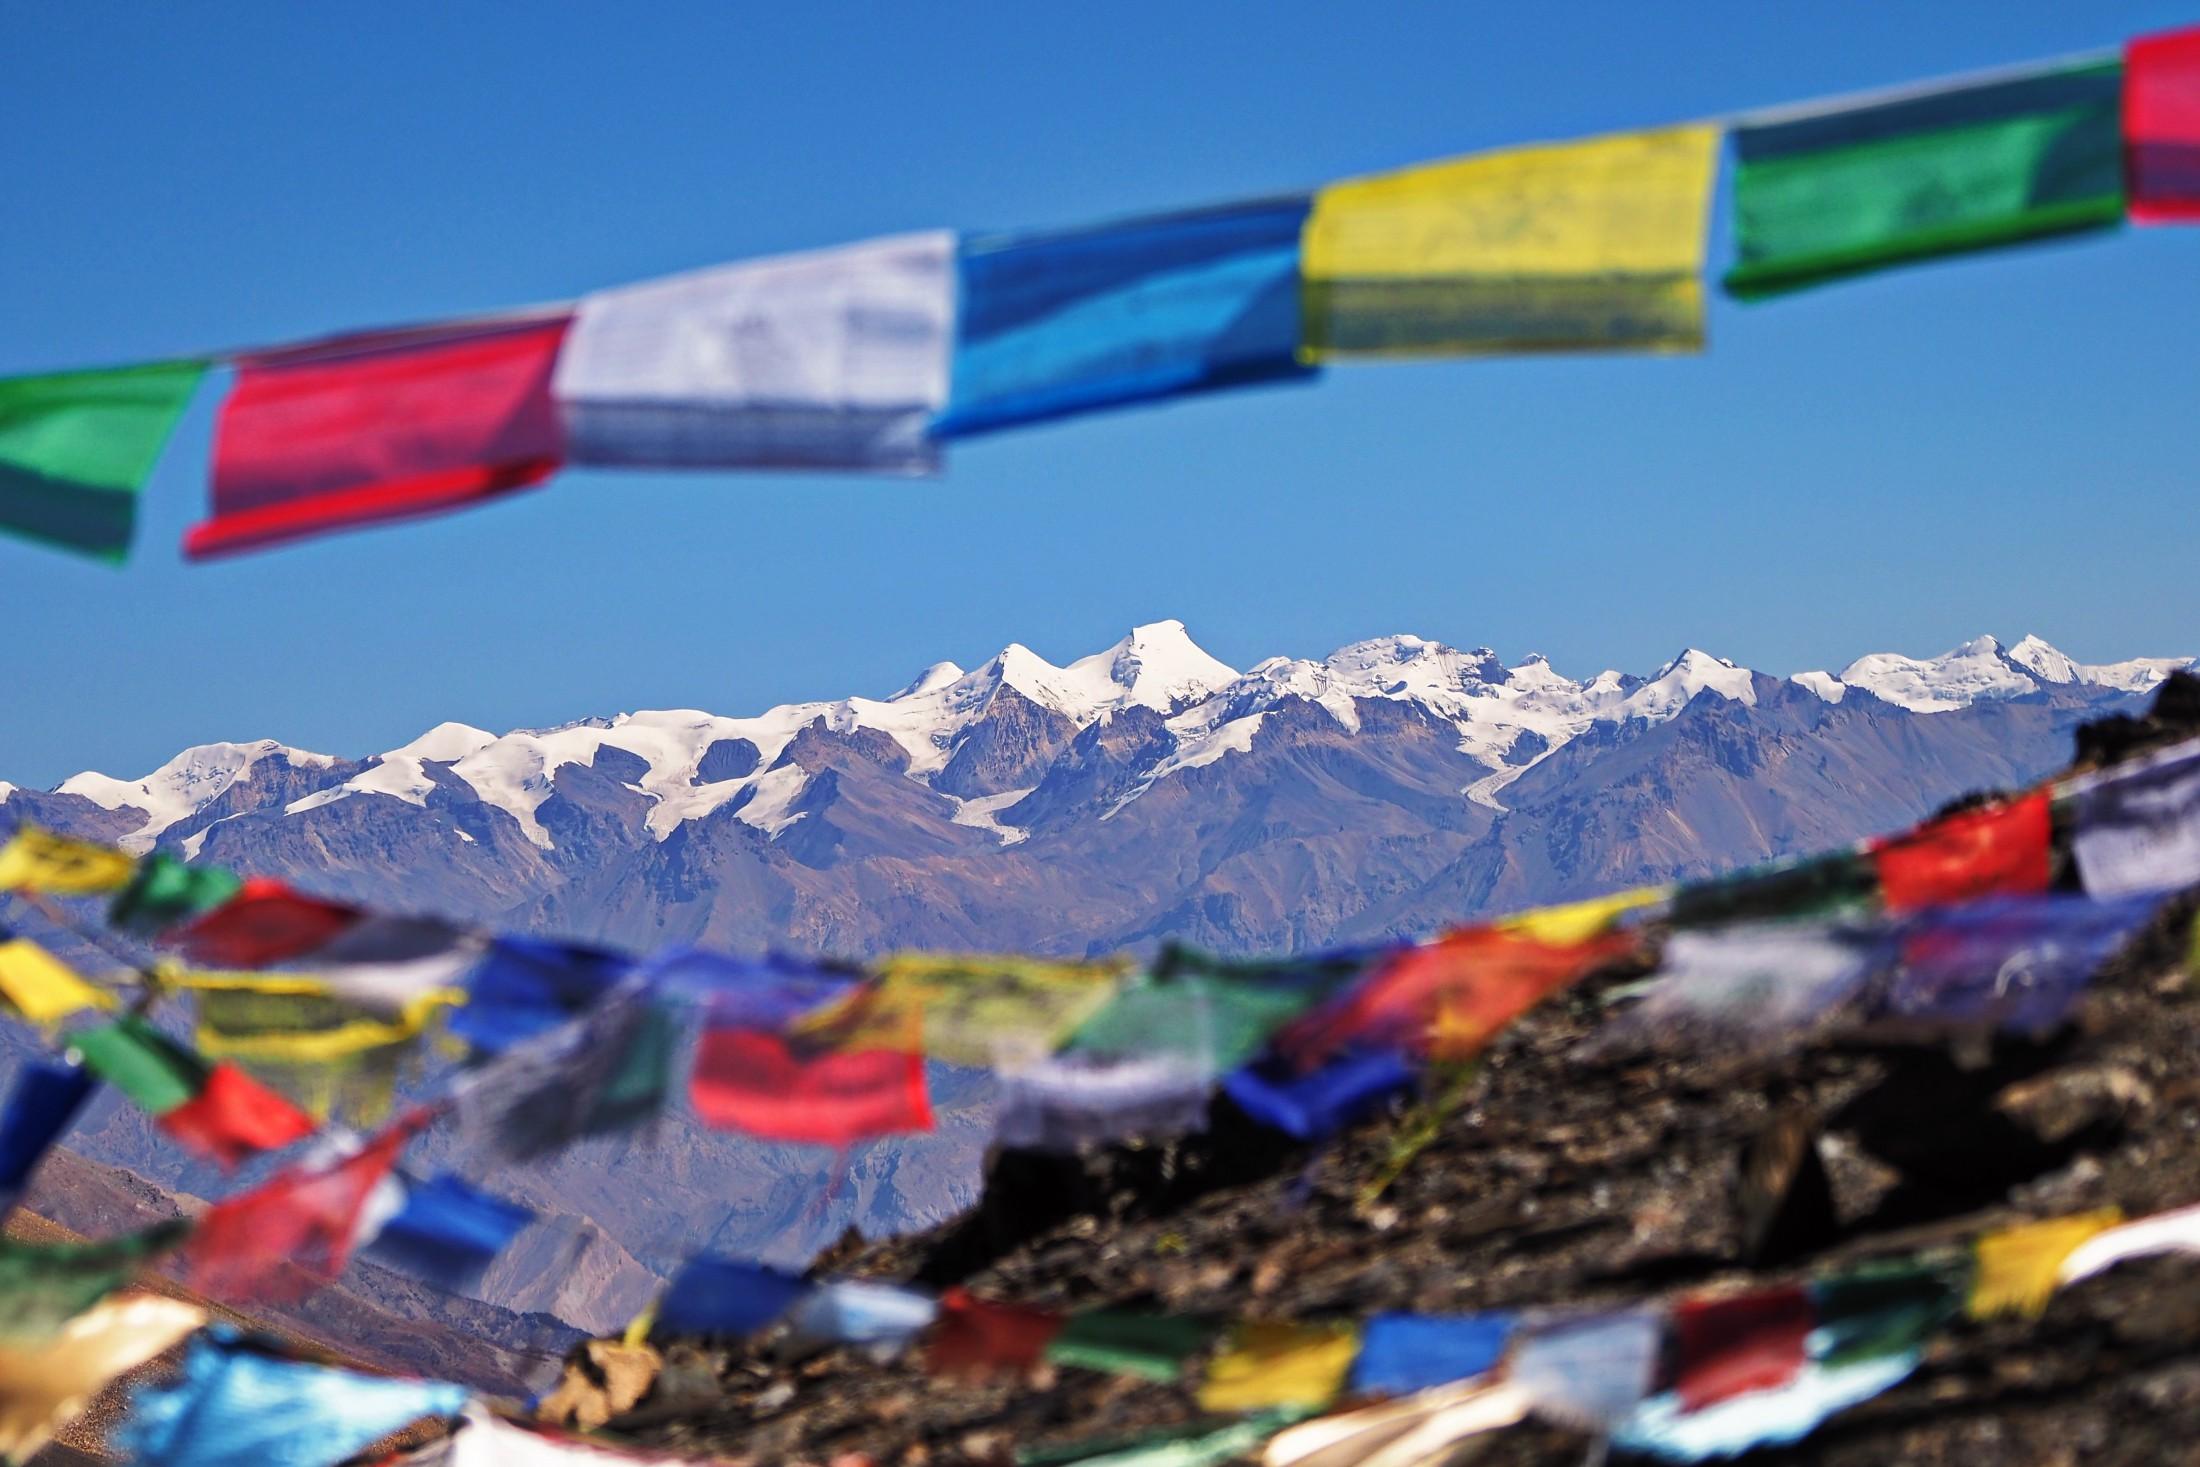 NEPAL - Menschen-Berge-Götter, Mittwoch, 14. Februar, 19:30 Uhr